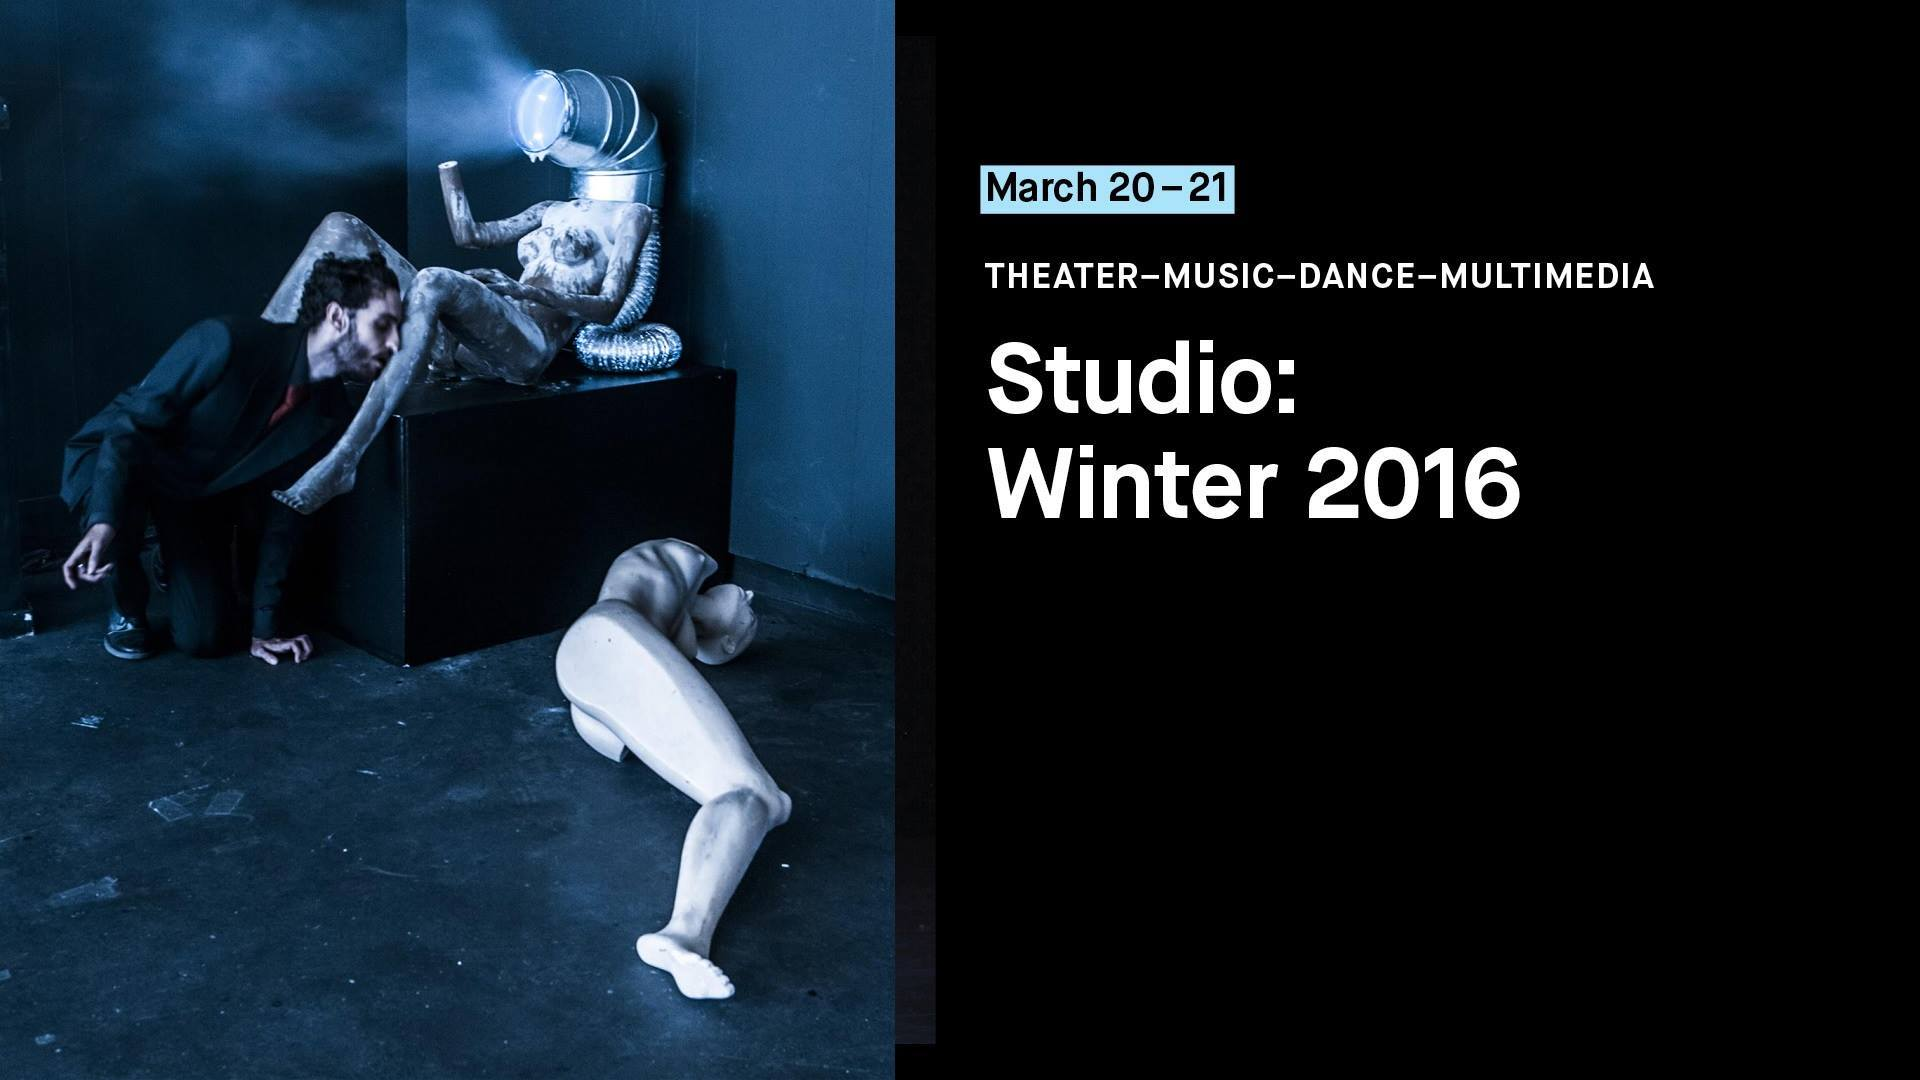 Untitled 16 - Studio: Winter 2016@Redcat